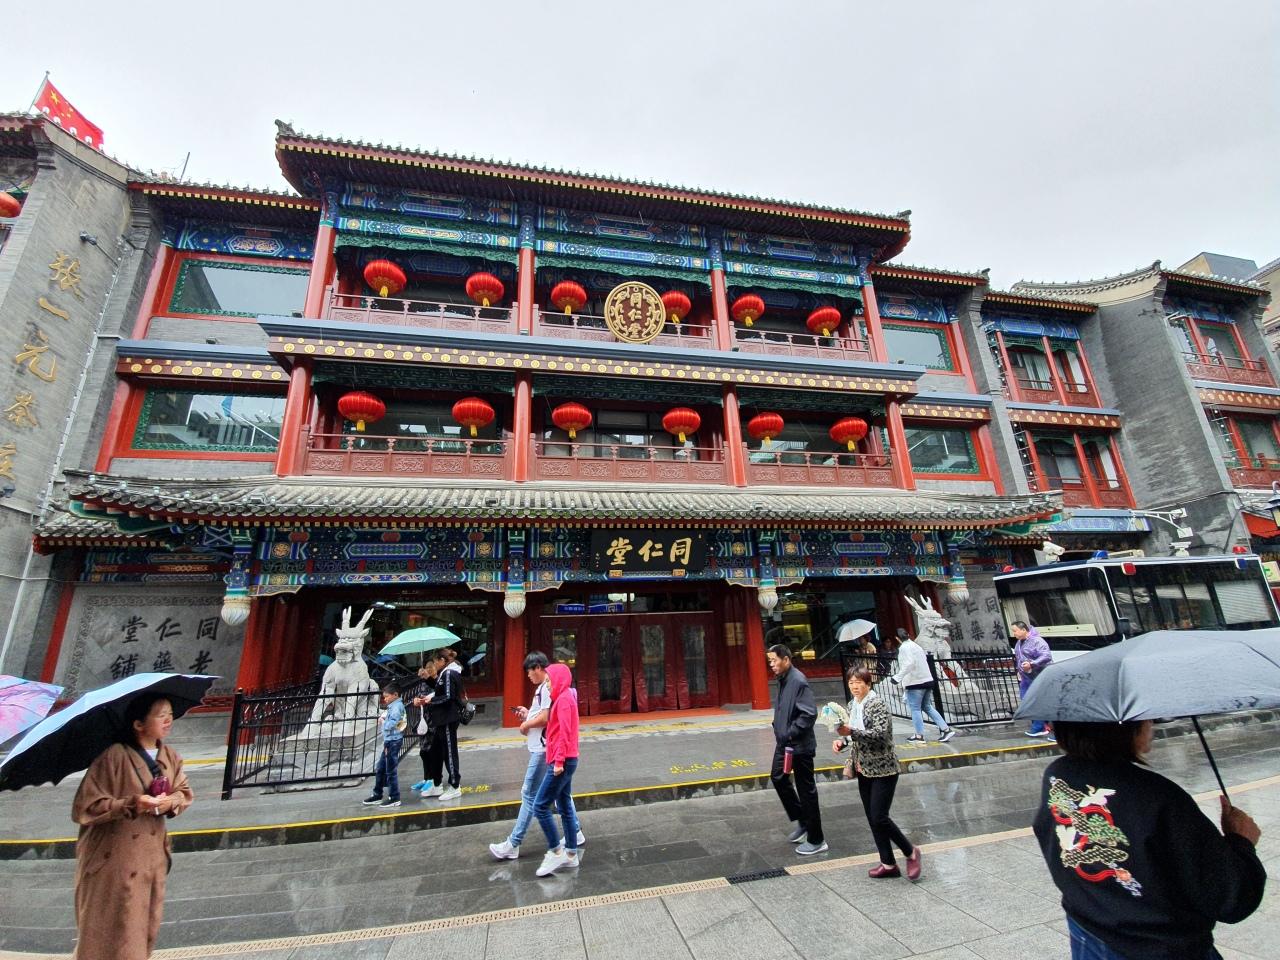 Day 34: AroundBeijing